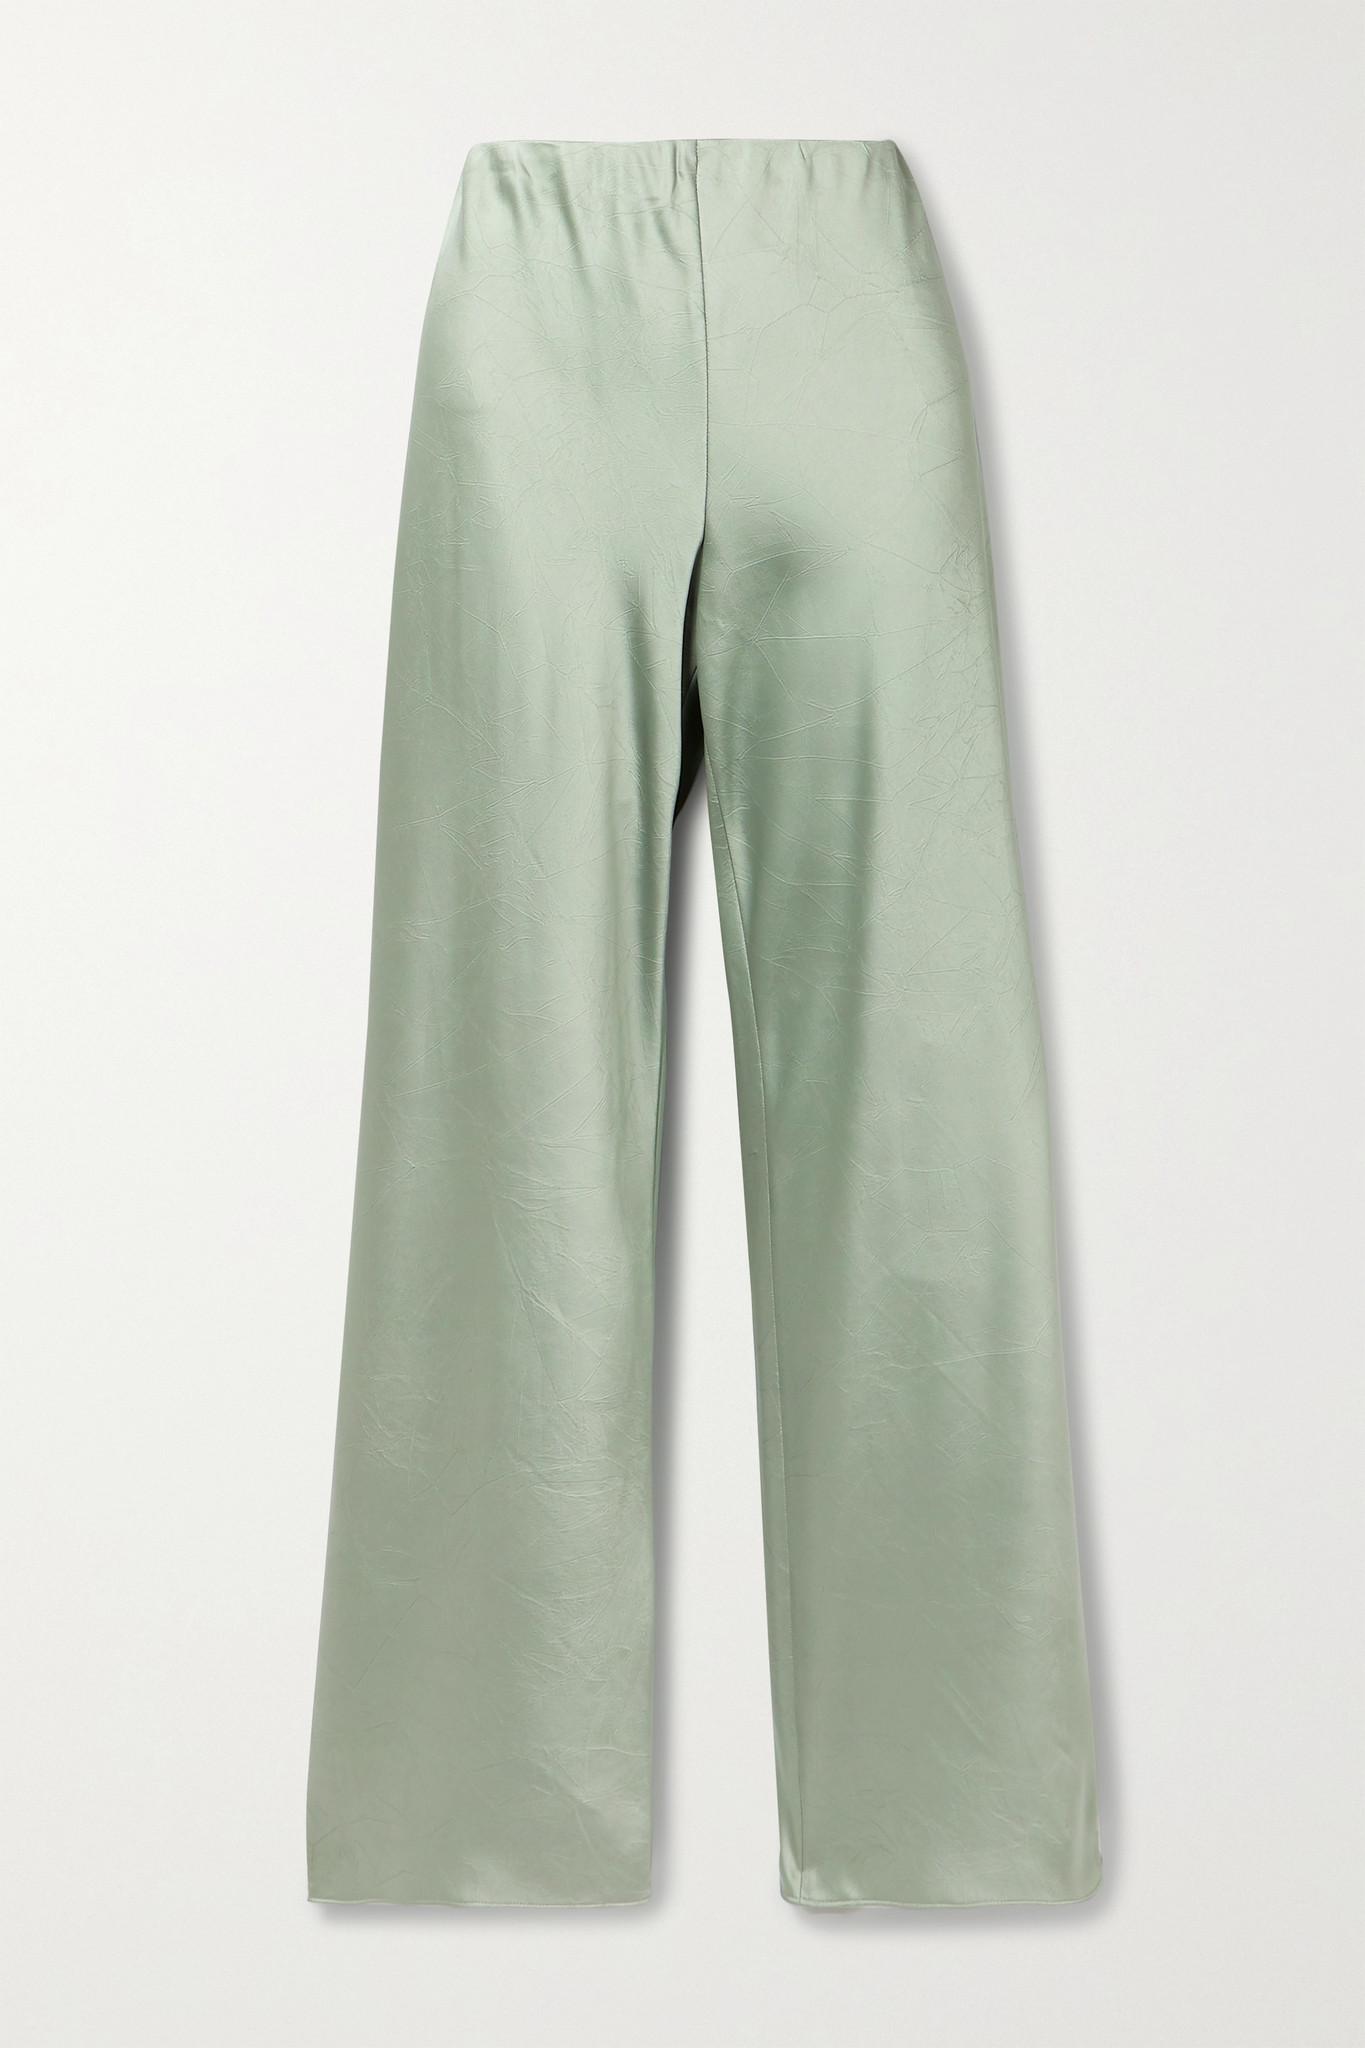 VINCE - Crinkled-satin Straight-leg Pants - Green - small